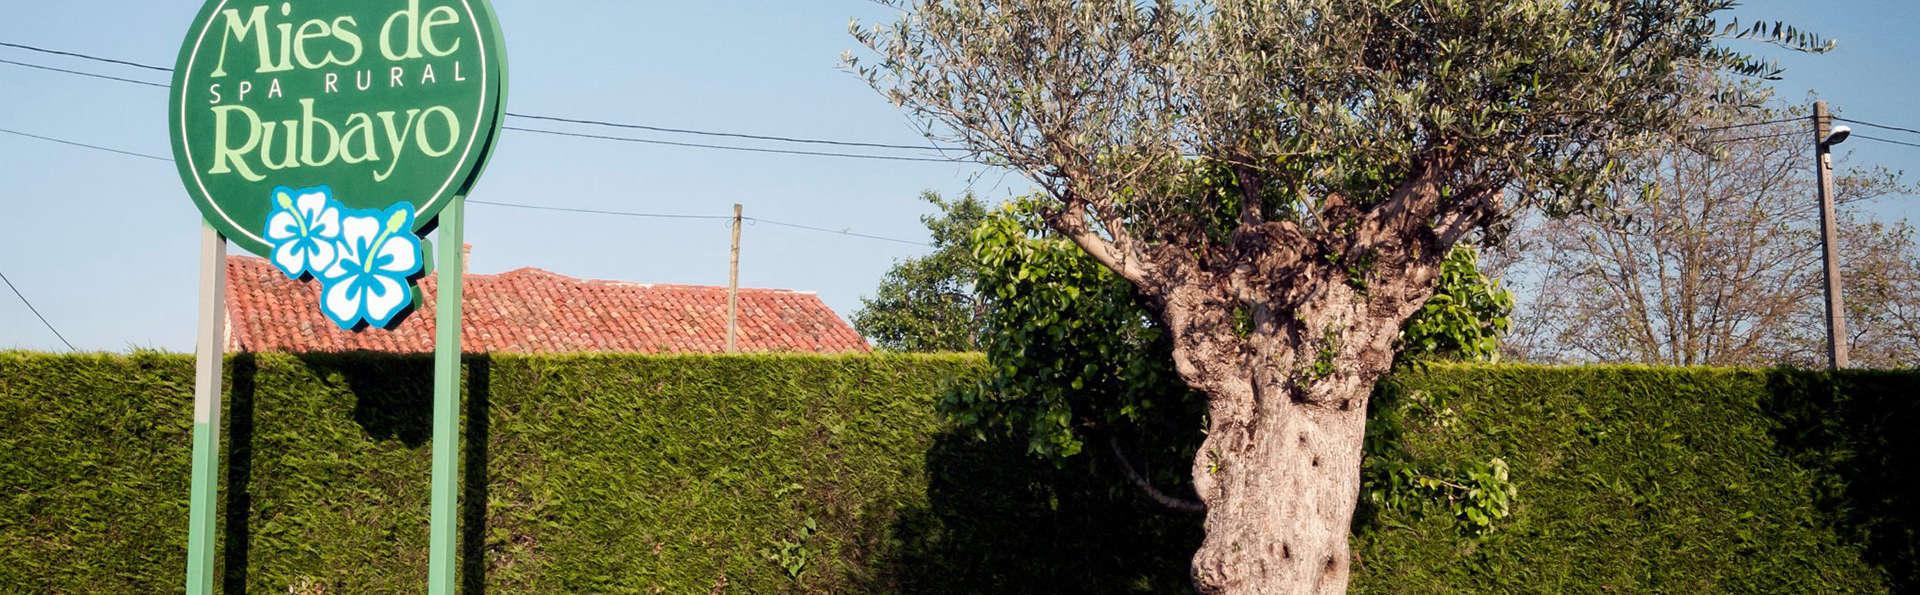 Spa Rural Mies de Rubayo - EDIT_garden.jpg